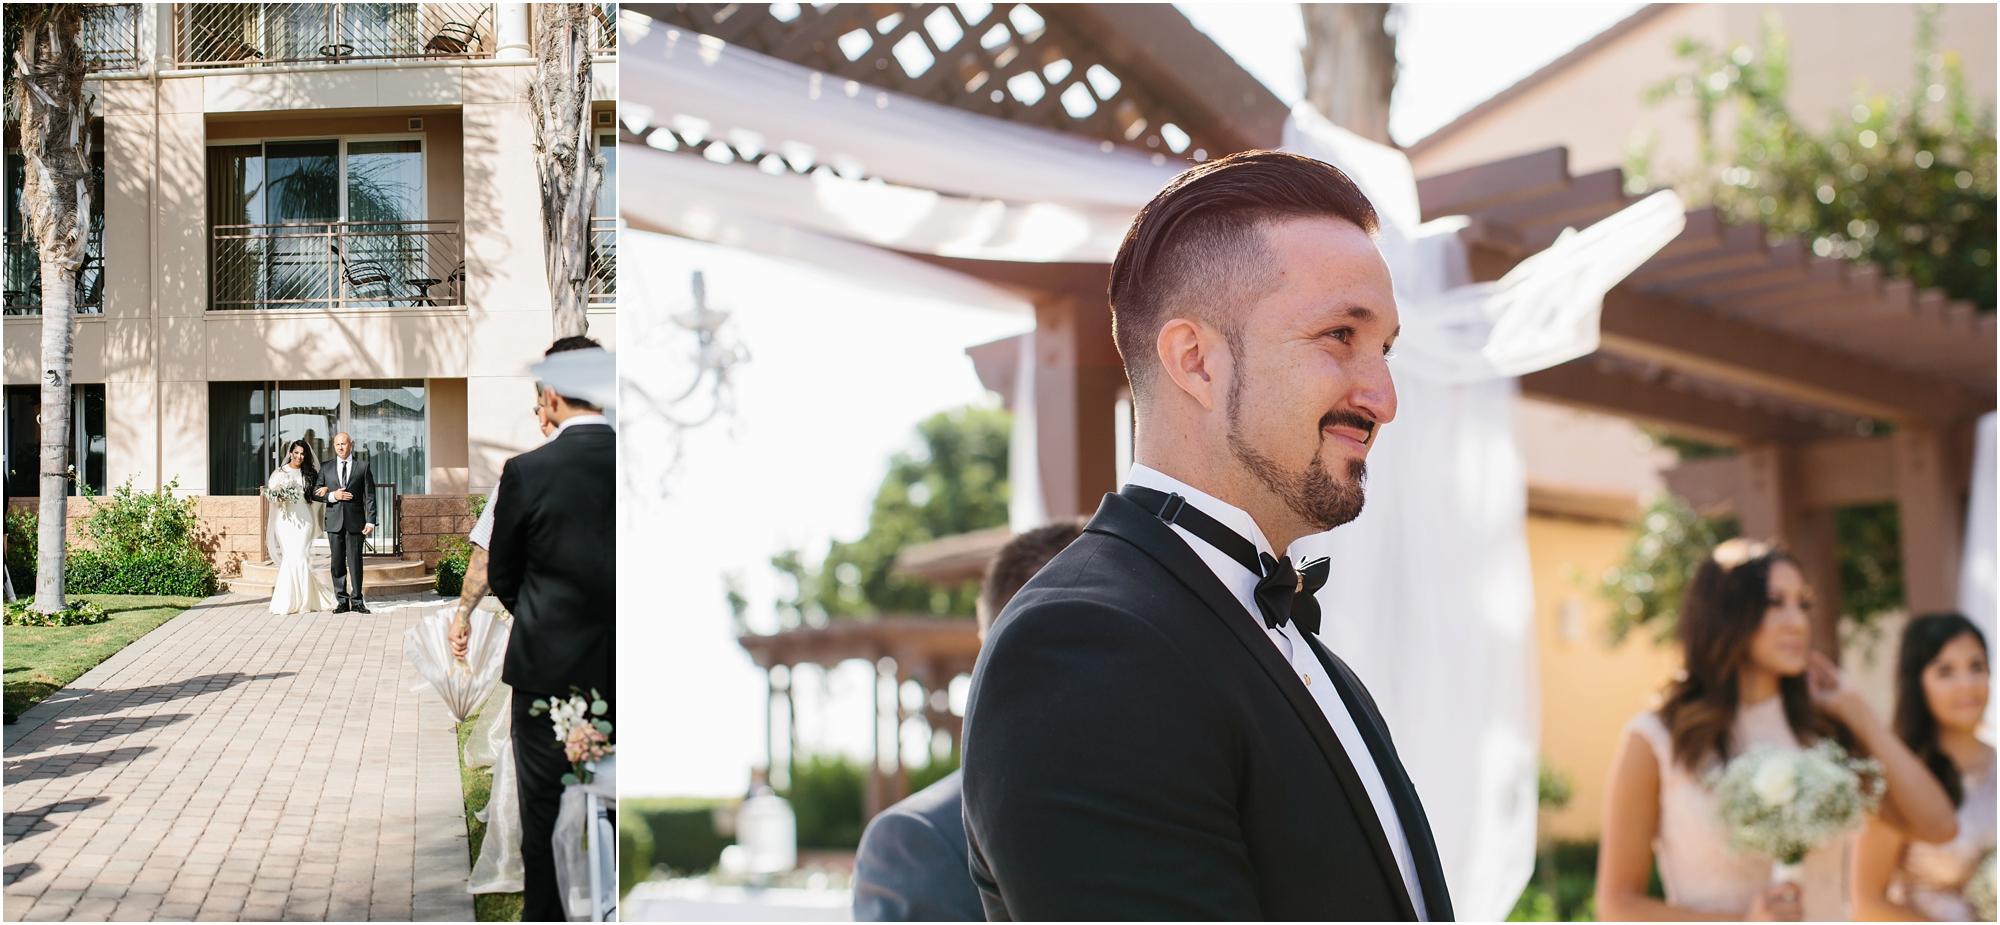 Wedding Ceremony - http://brittneyhannonphotography.com